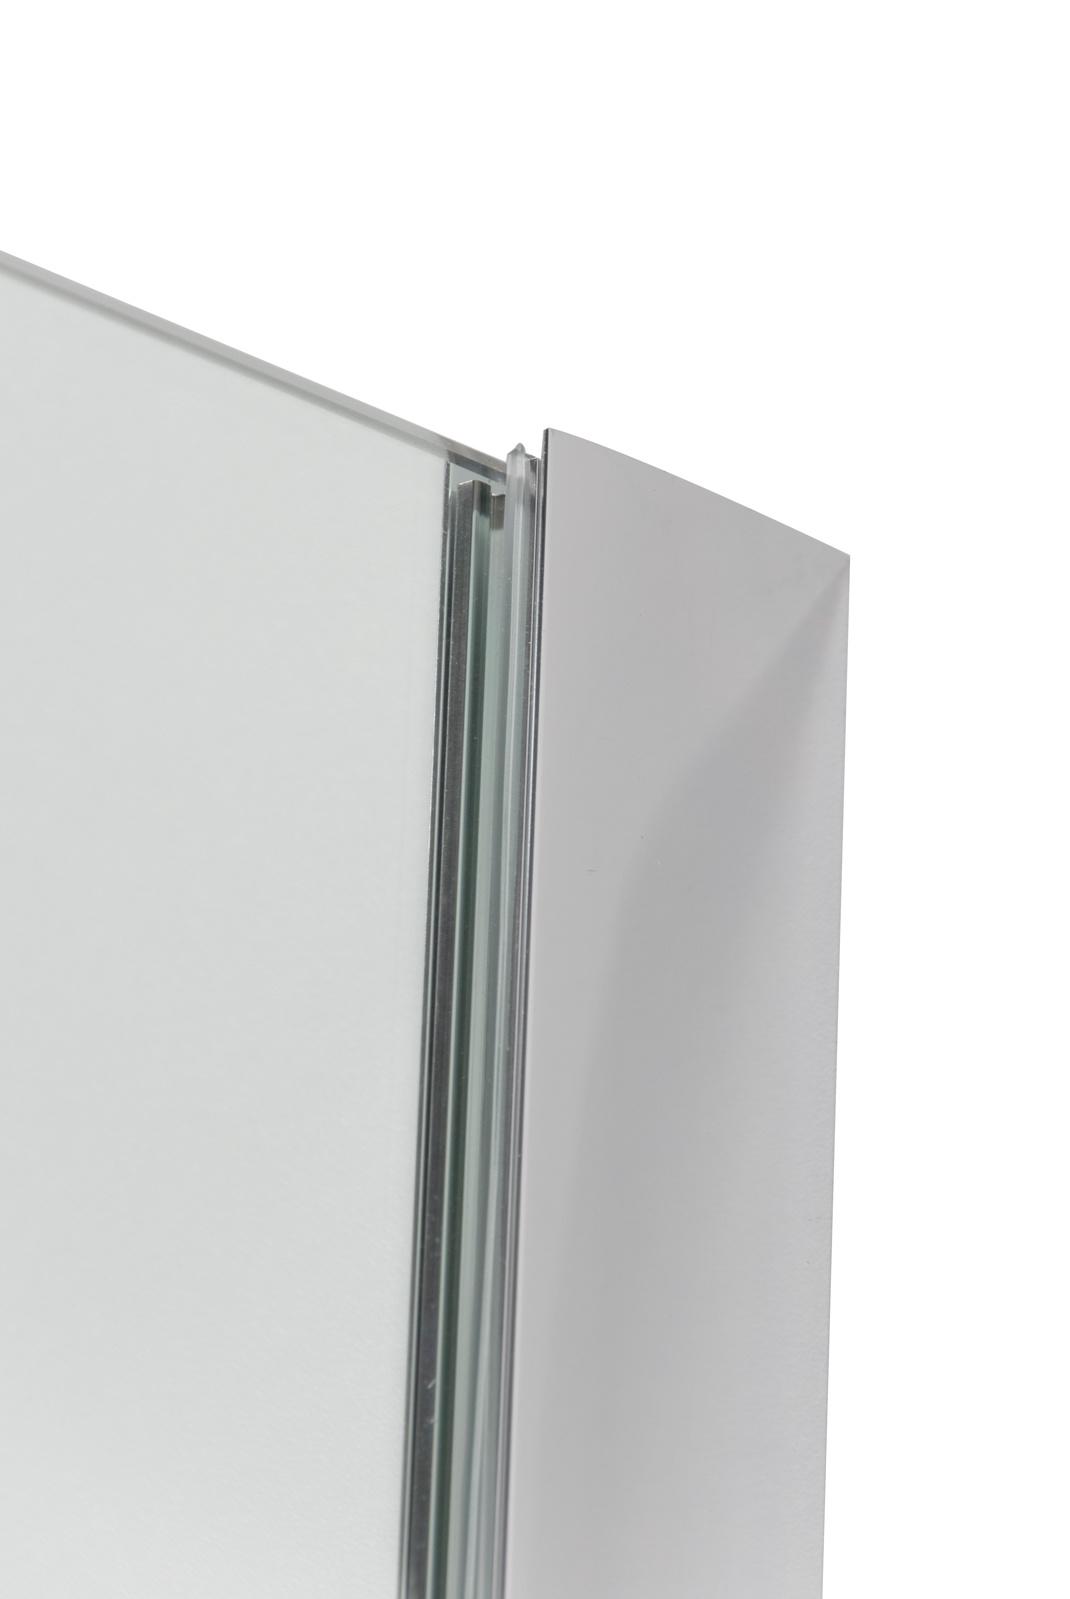 Linea Uno Inloopdouche Göteborg 150 x 200 cm